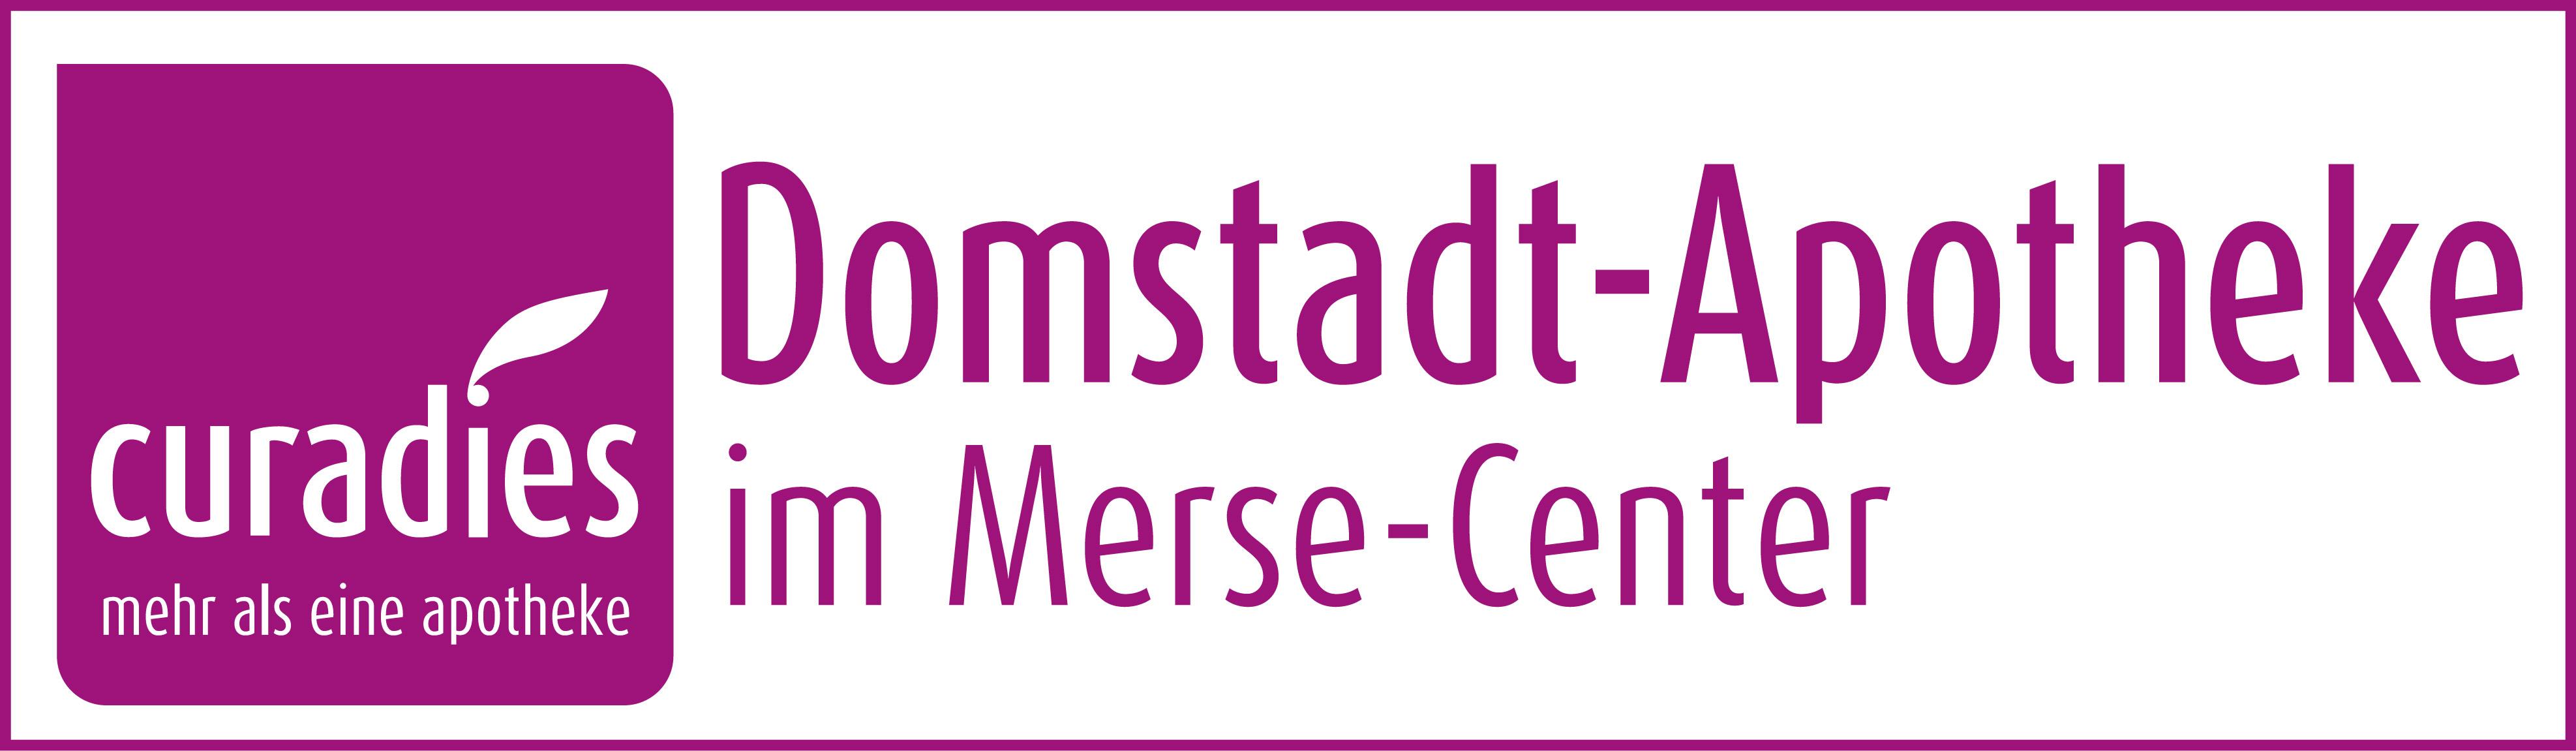 Logo der Domstadt-Apotheke